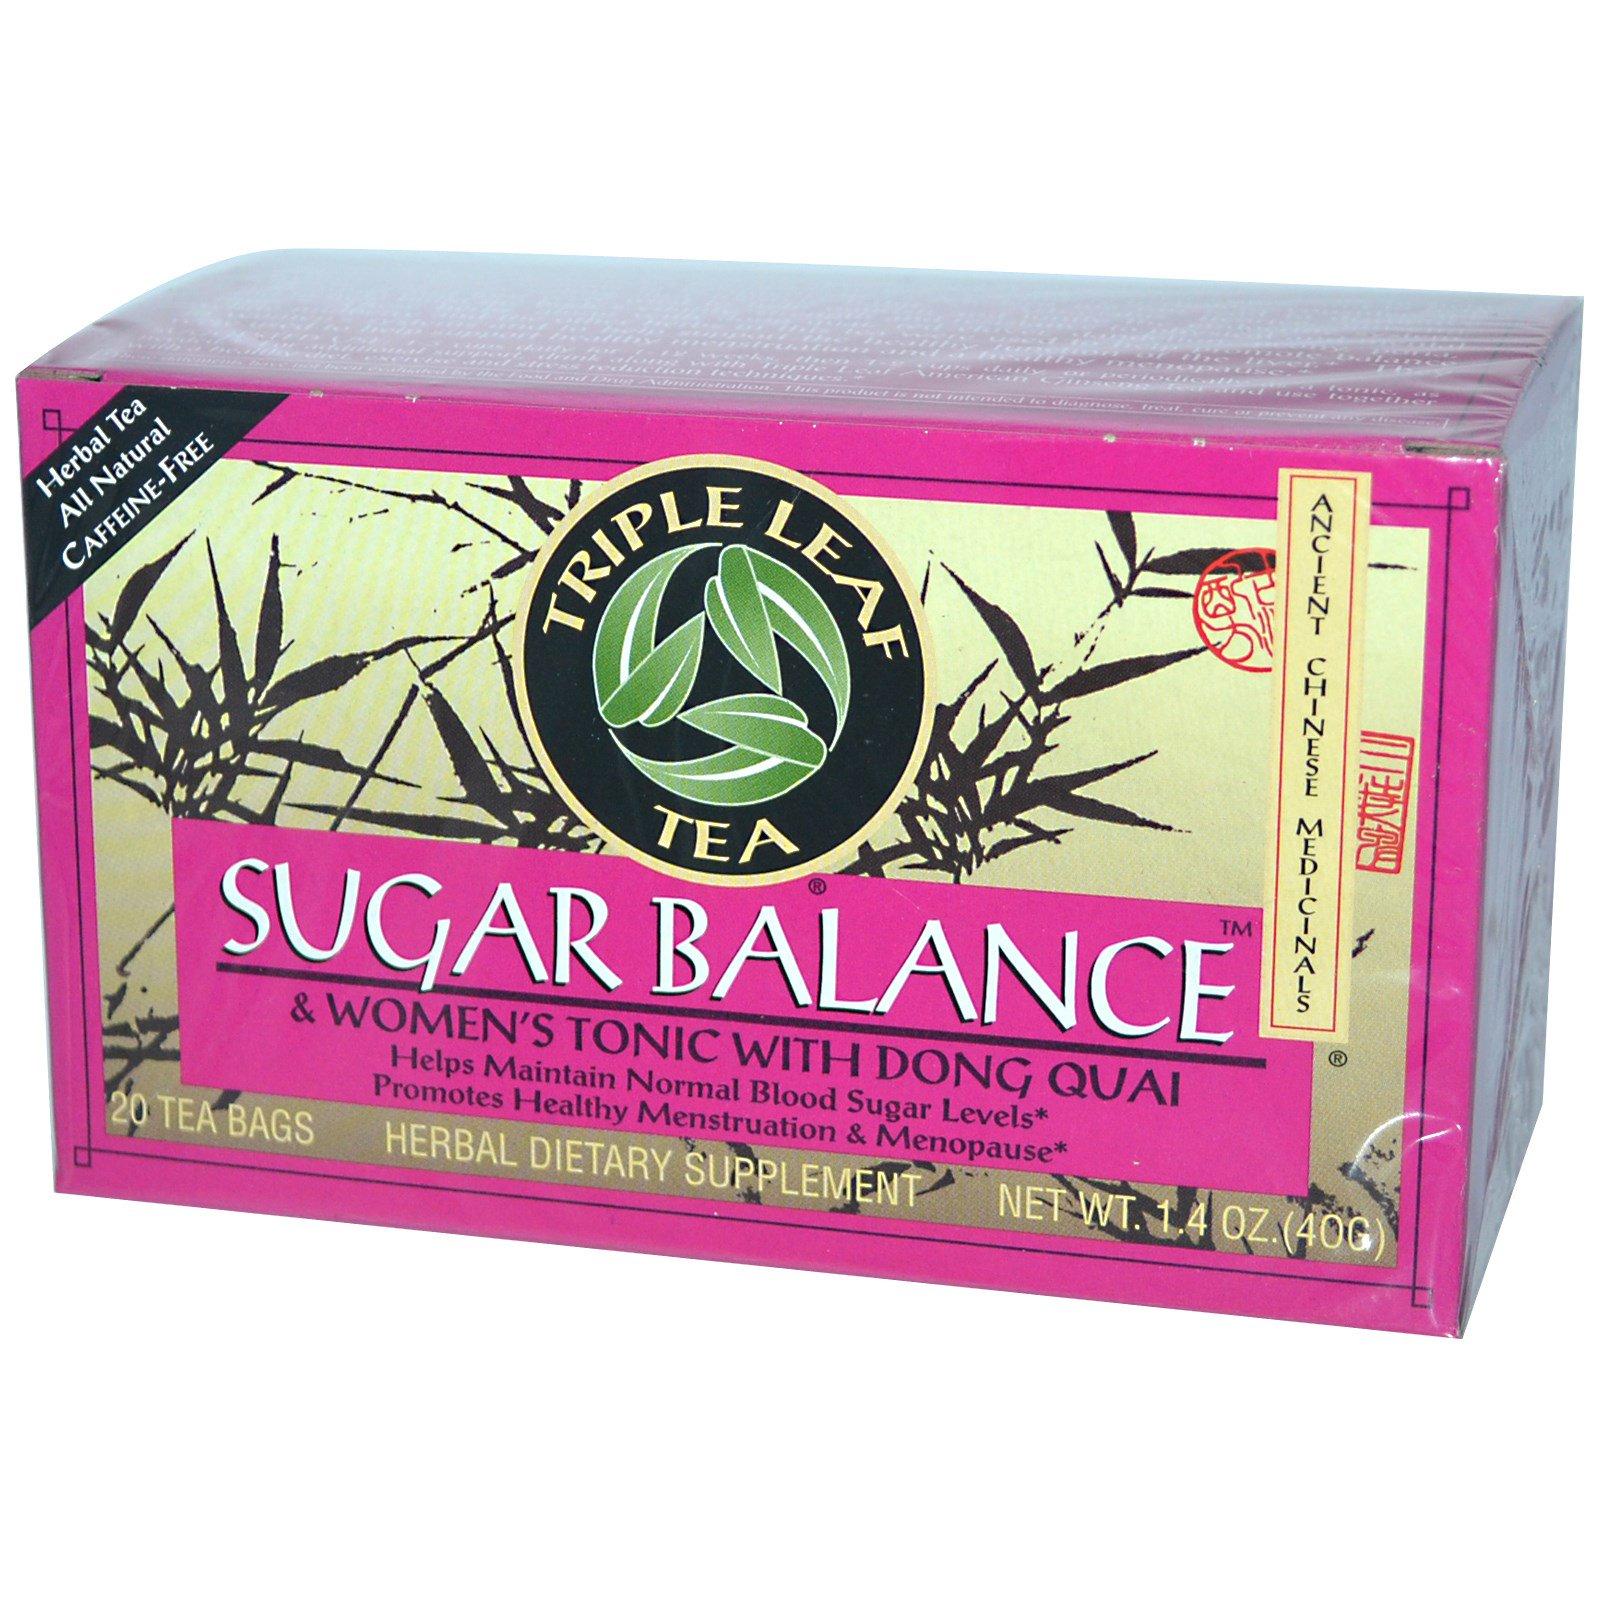 Triple Leaf Tea Sugar Balance Caffeine Free 20 Bags